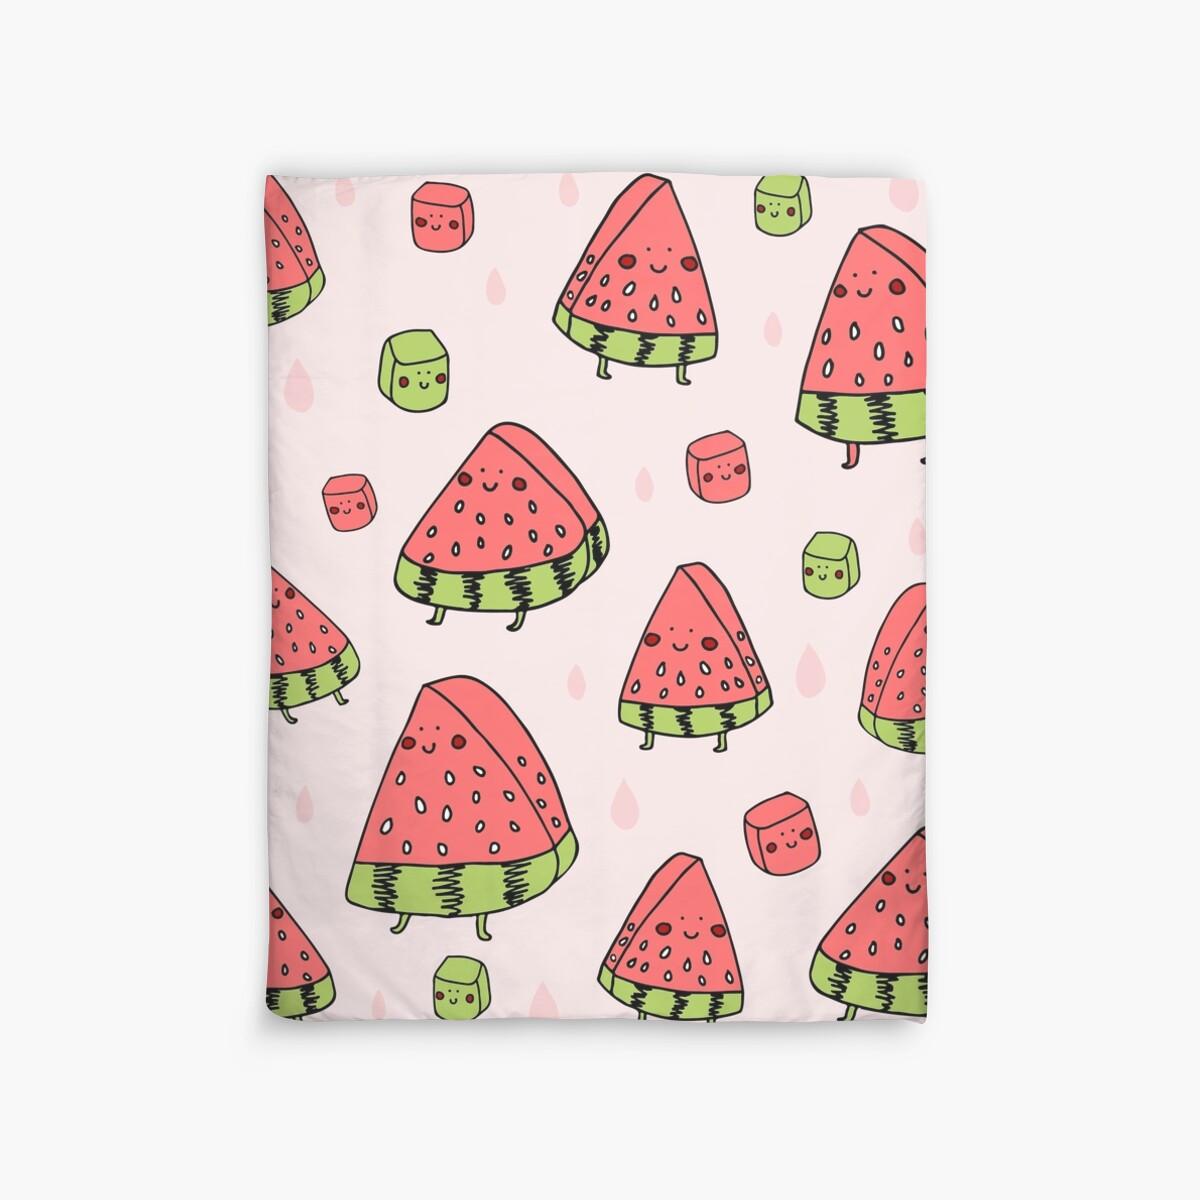 Quot Watermelon Quot Duvet Covers By Littleredcheeks Redbubble